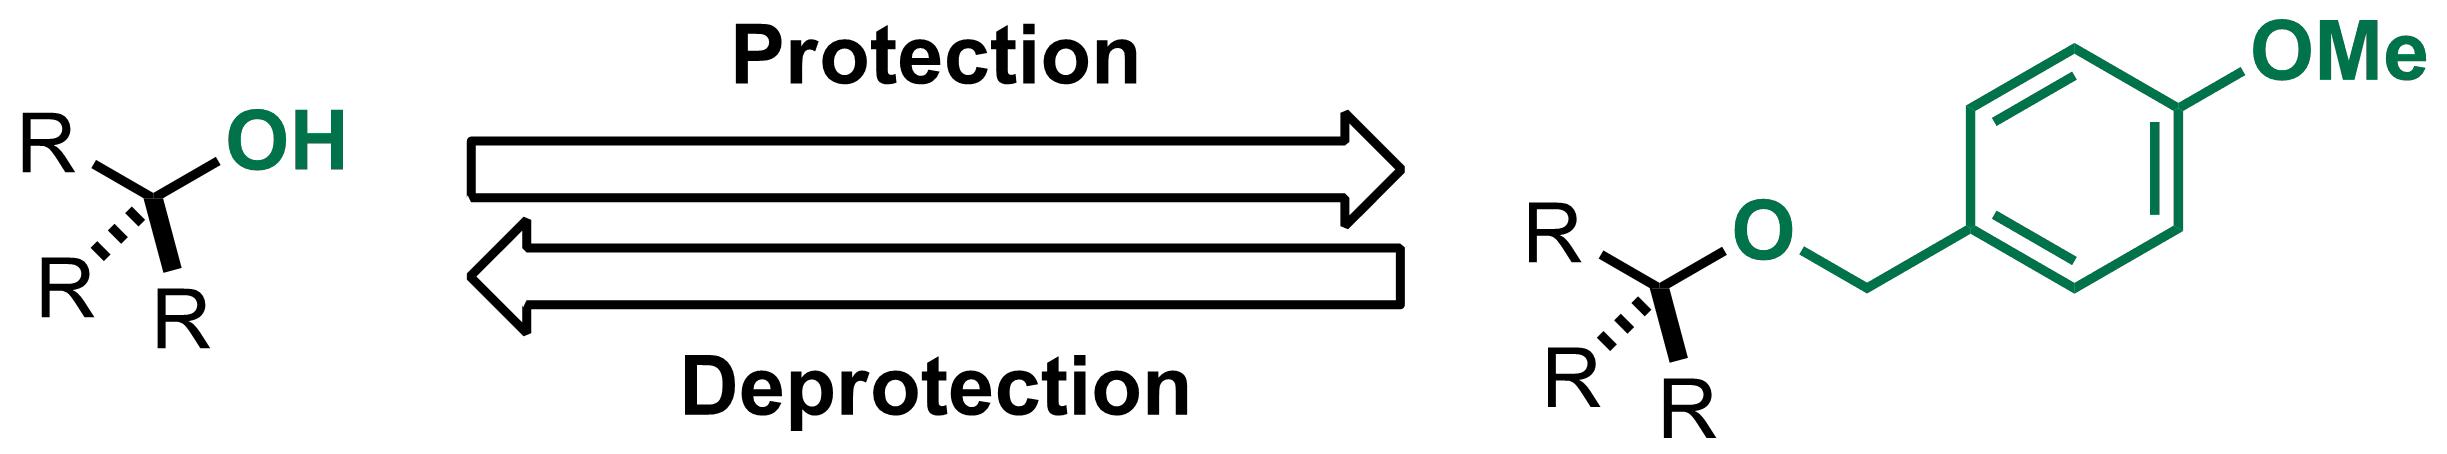 4-Methoxybenzyl ether (PMB) scheme